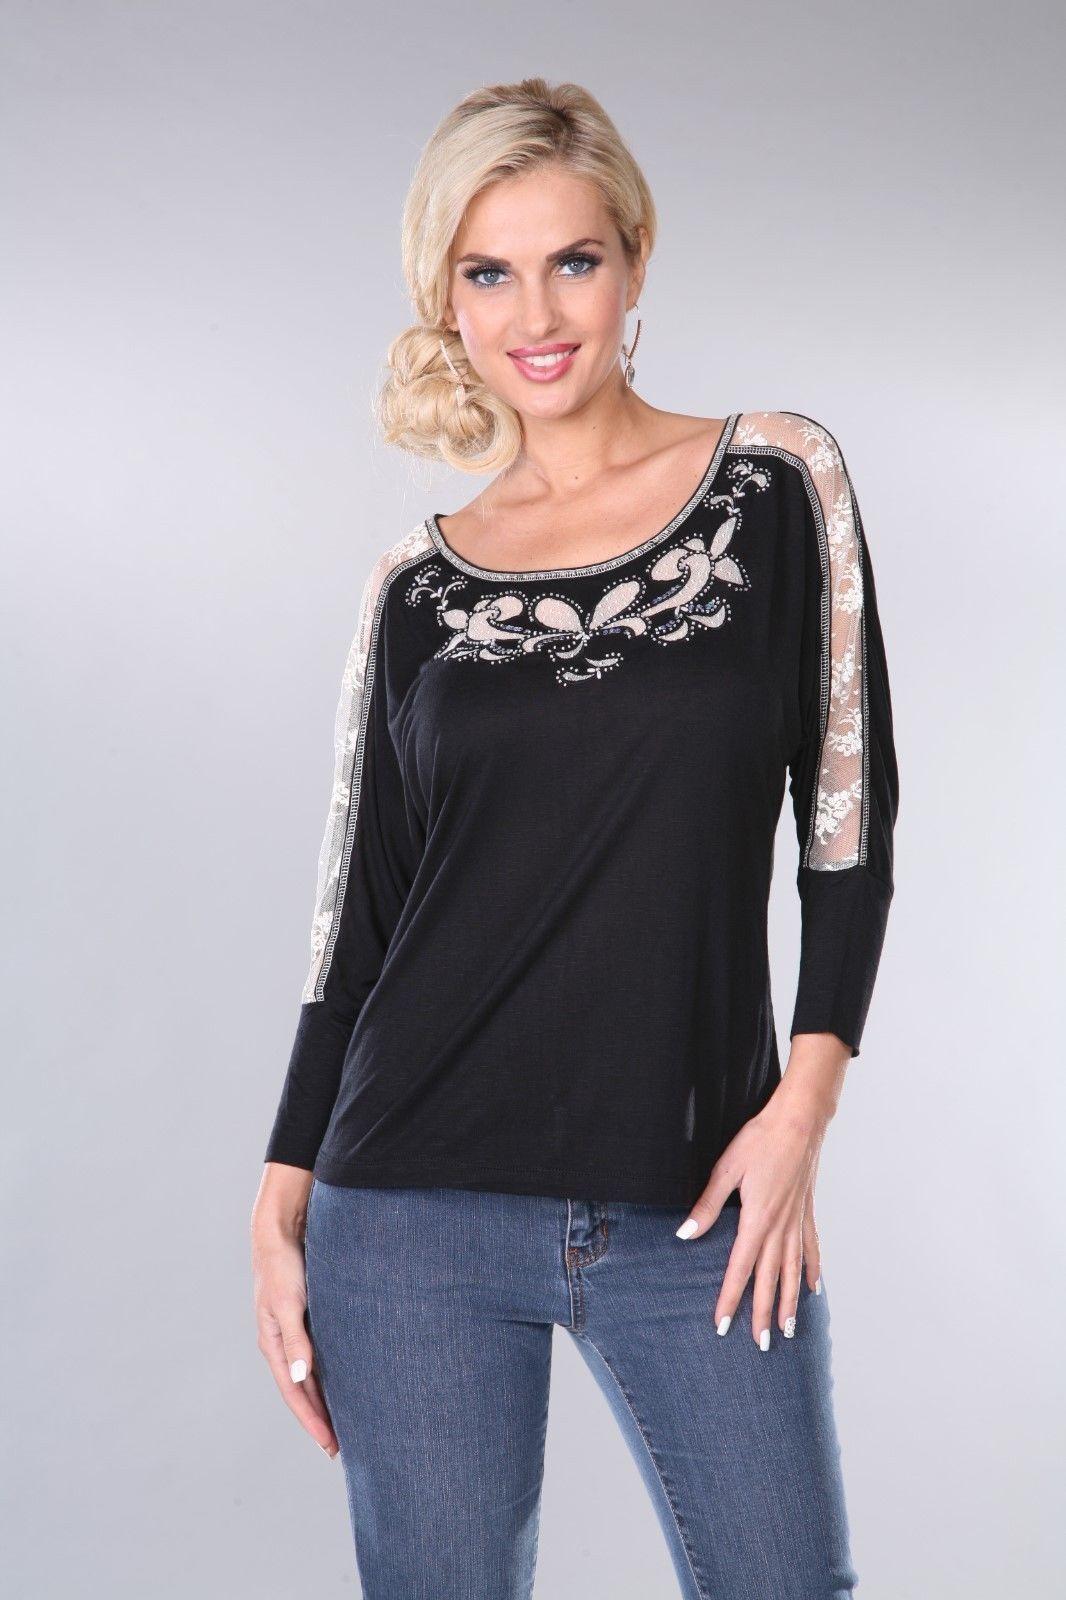 Woherren Top T-Shirt schwarz Cream Krista Lee Labyrinth Embellished Beaded Lace NEW